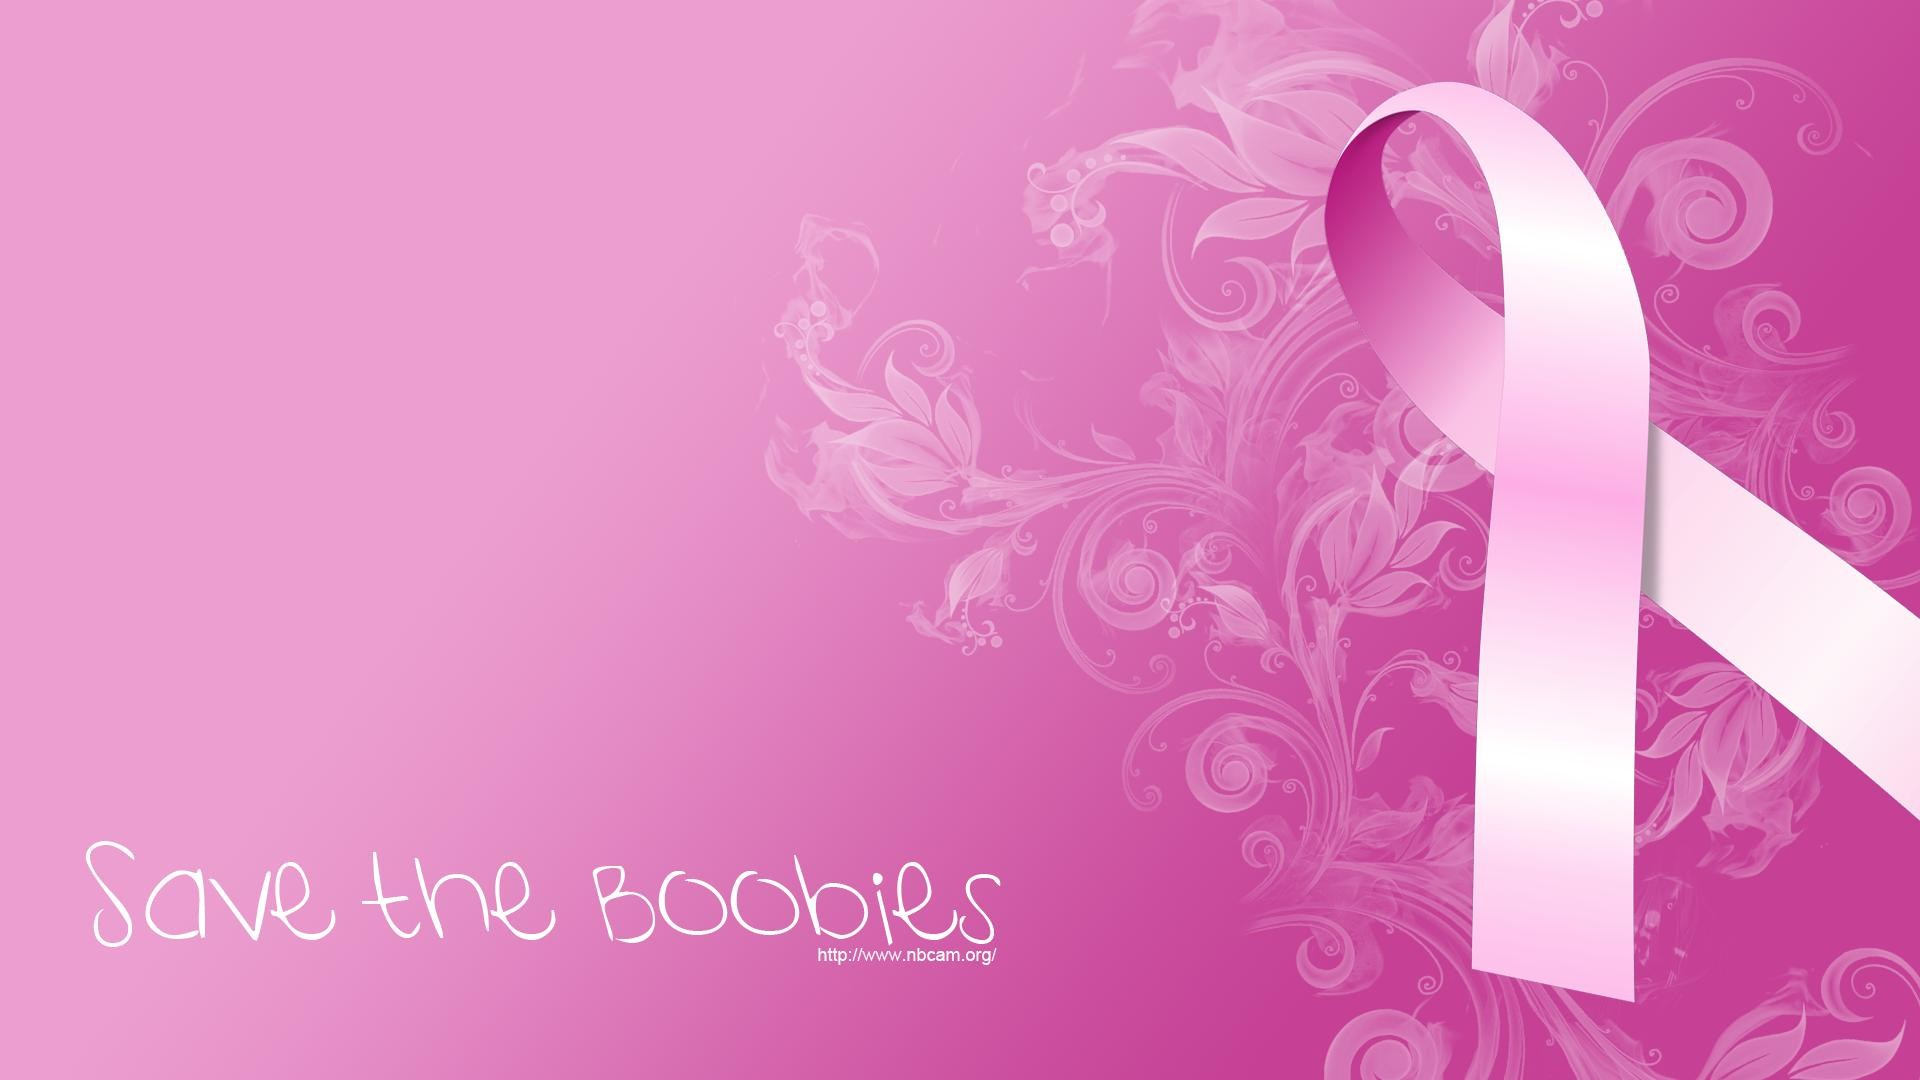 Breast Cancer Awareness Wallpaper